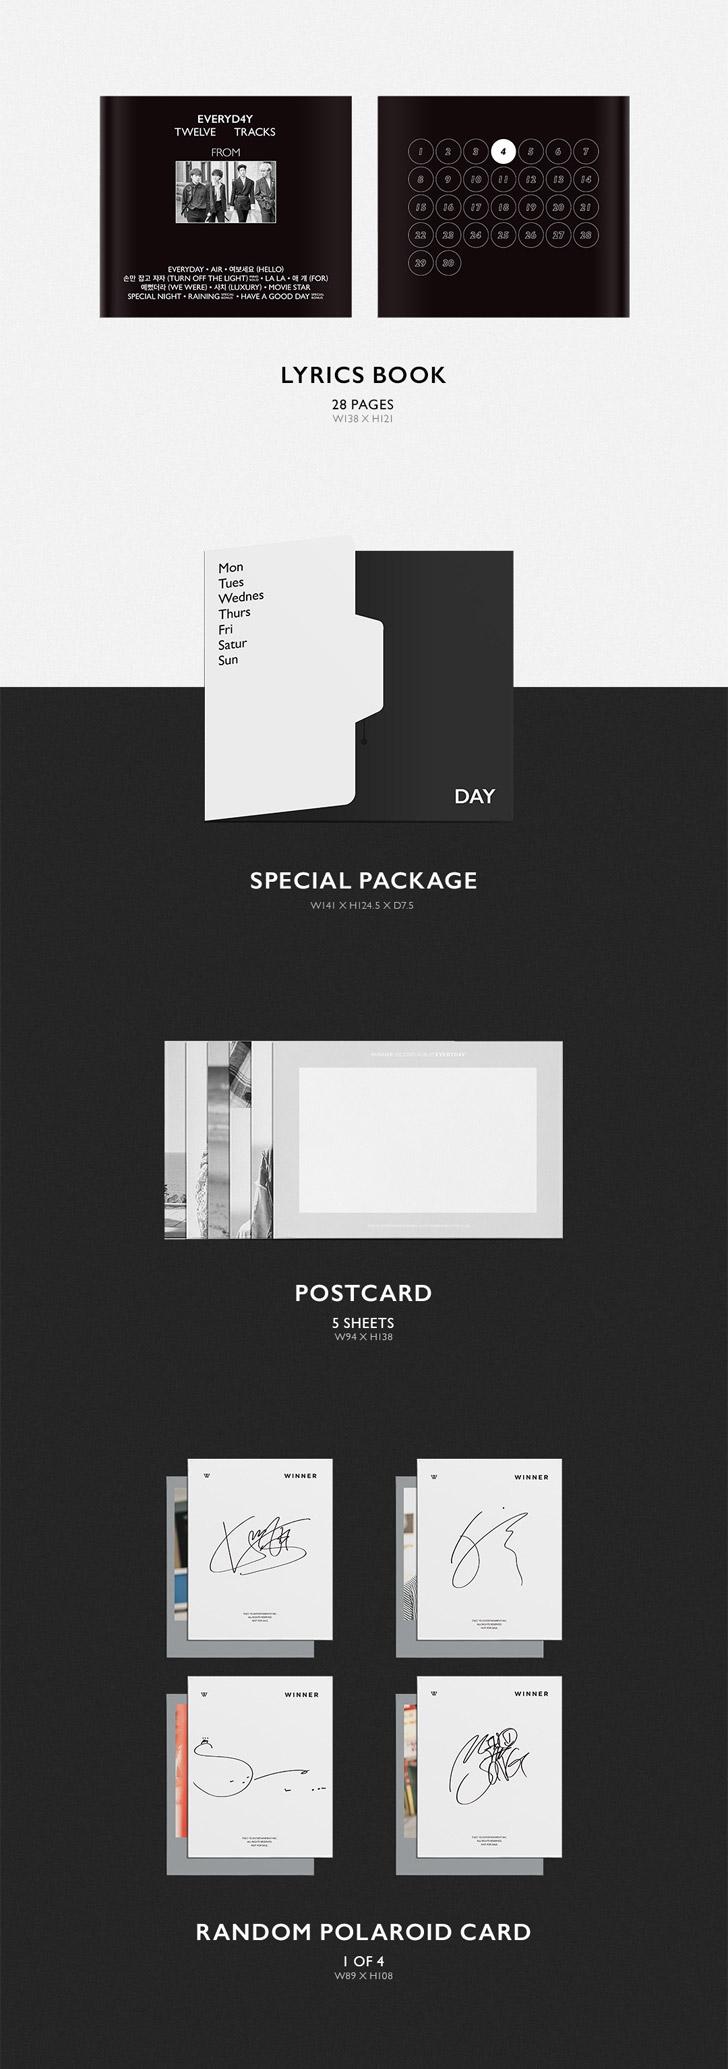 WINNER 2nd Album - EVERYD4Y(Night ver) CD + Poster